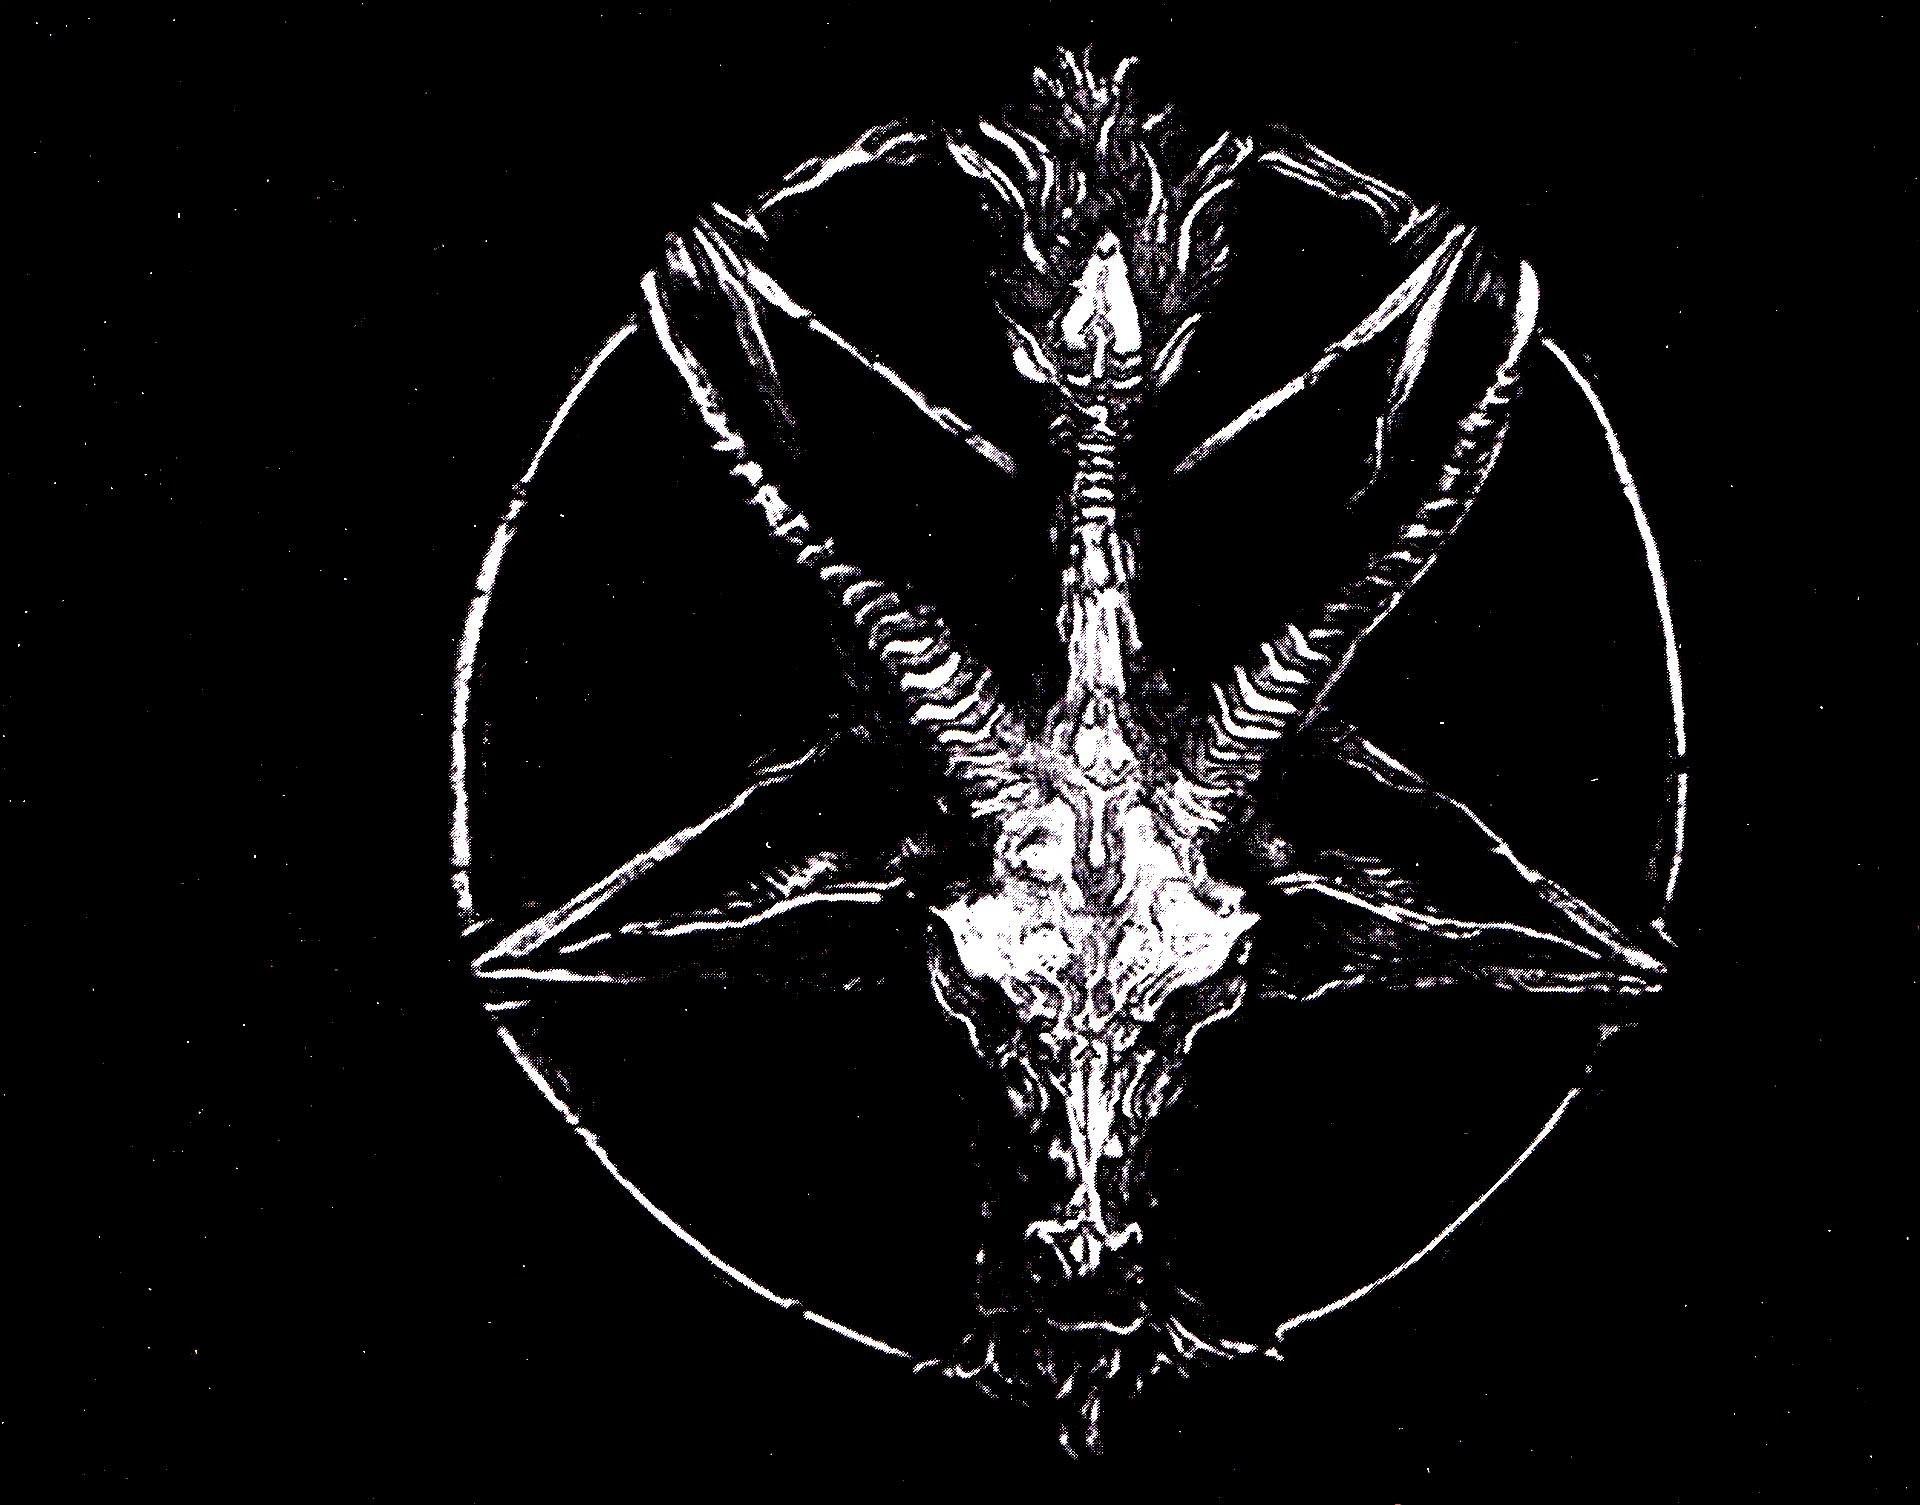 Lucifer Wallpaper 4k: Satanic Wallpaper ·① Download Free Amazing HD Wallpapers